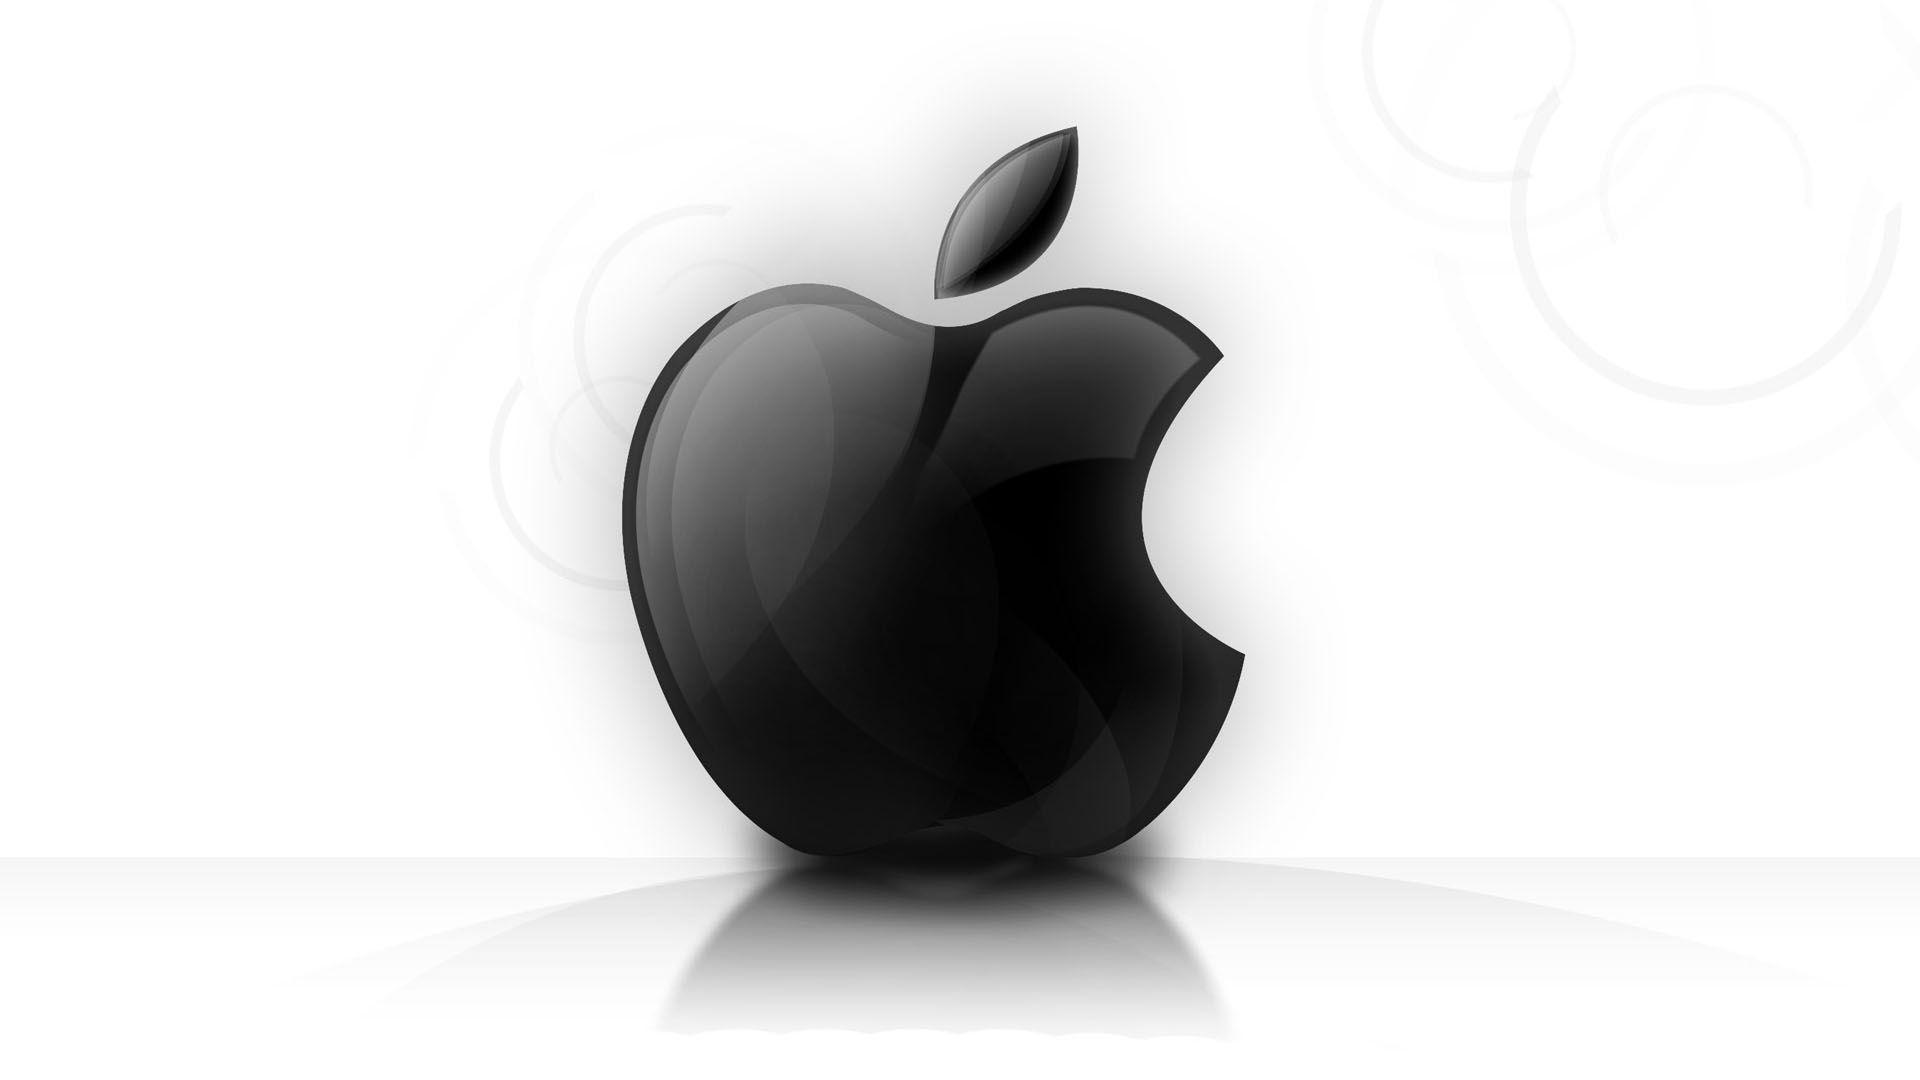 Apple Logo LG G Wallpapers HD , LG G Wallpapers, LG Wallpapers 1920x1080